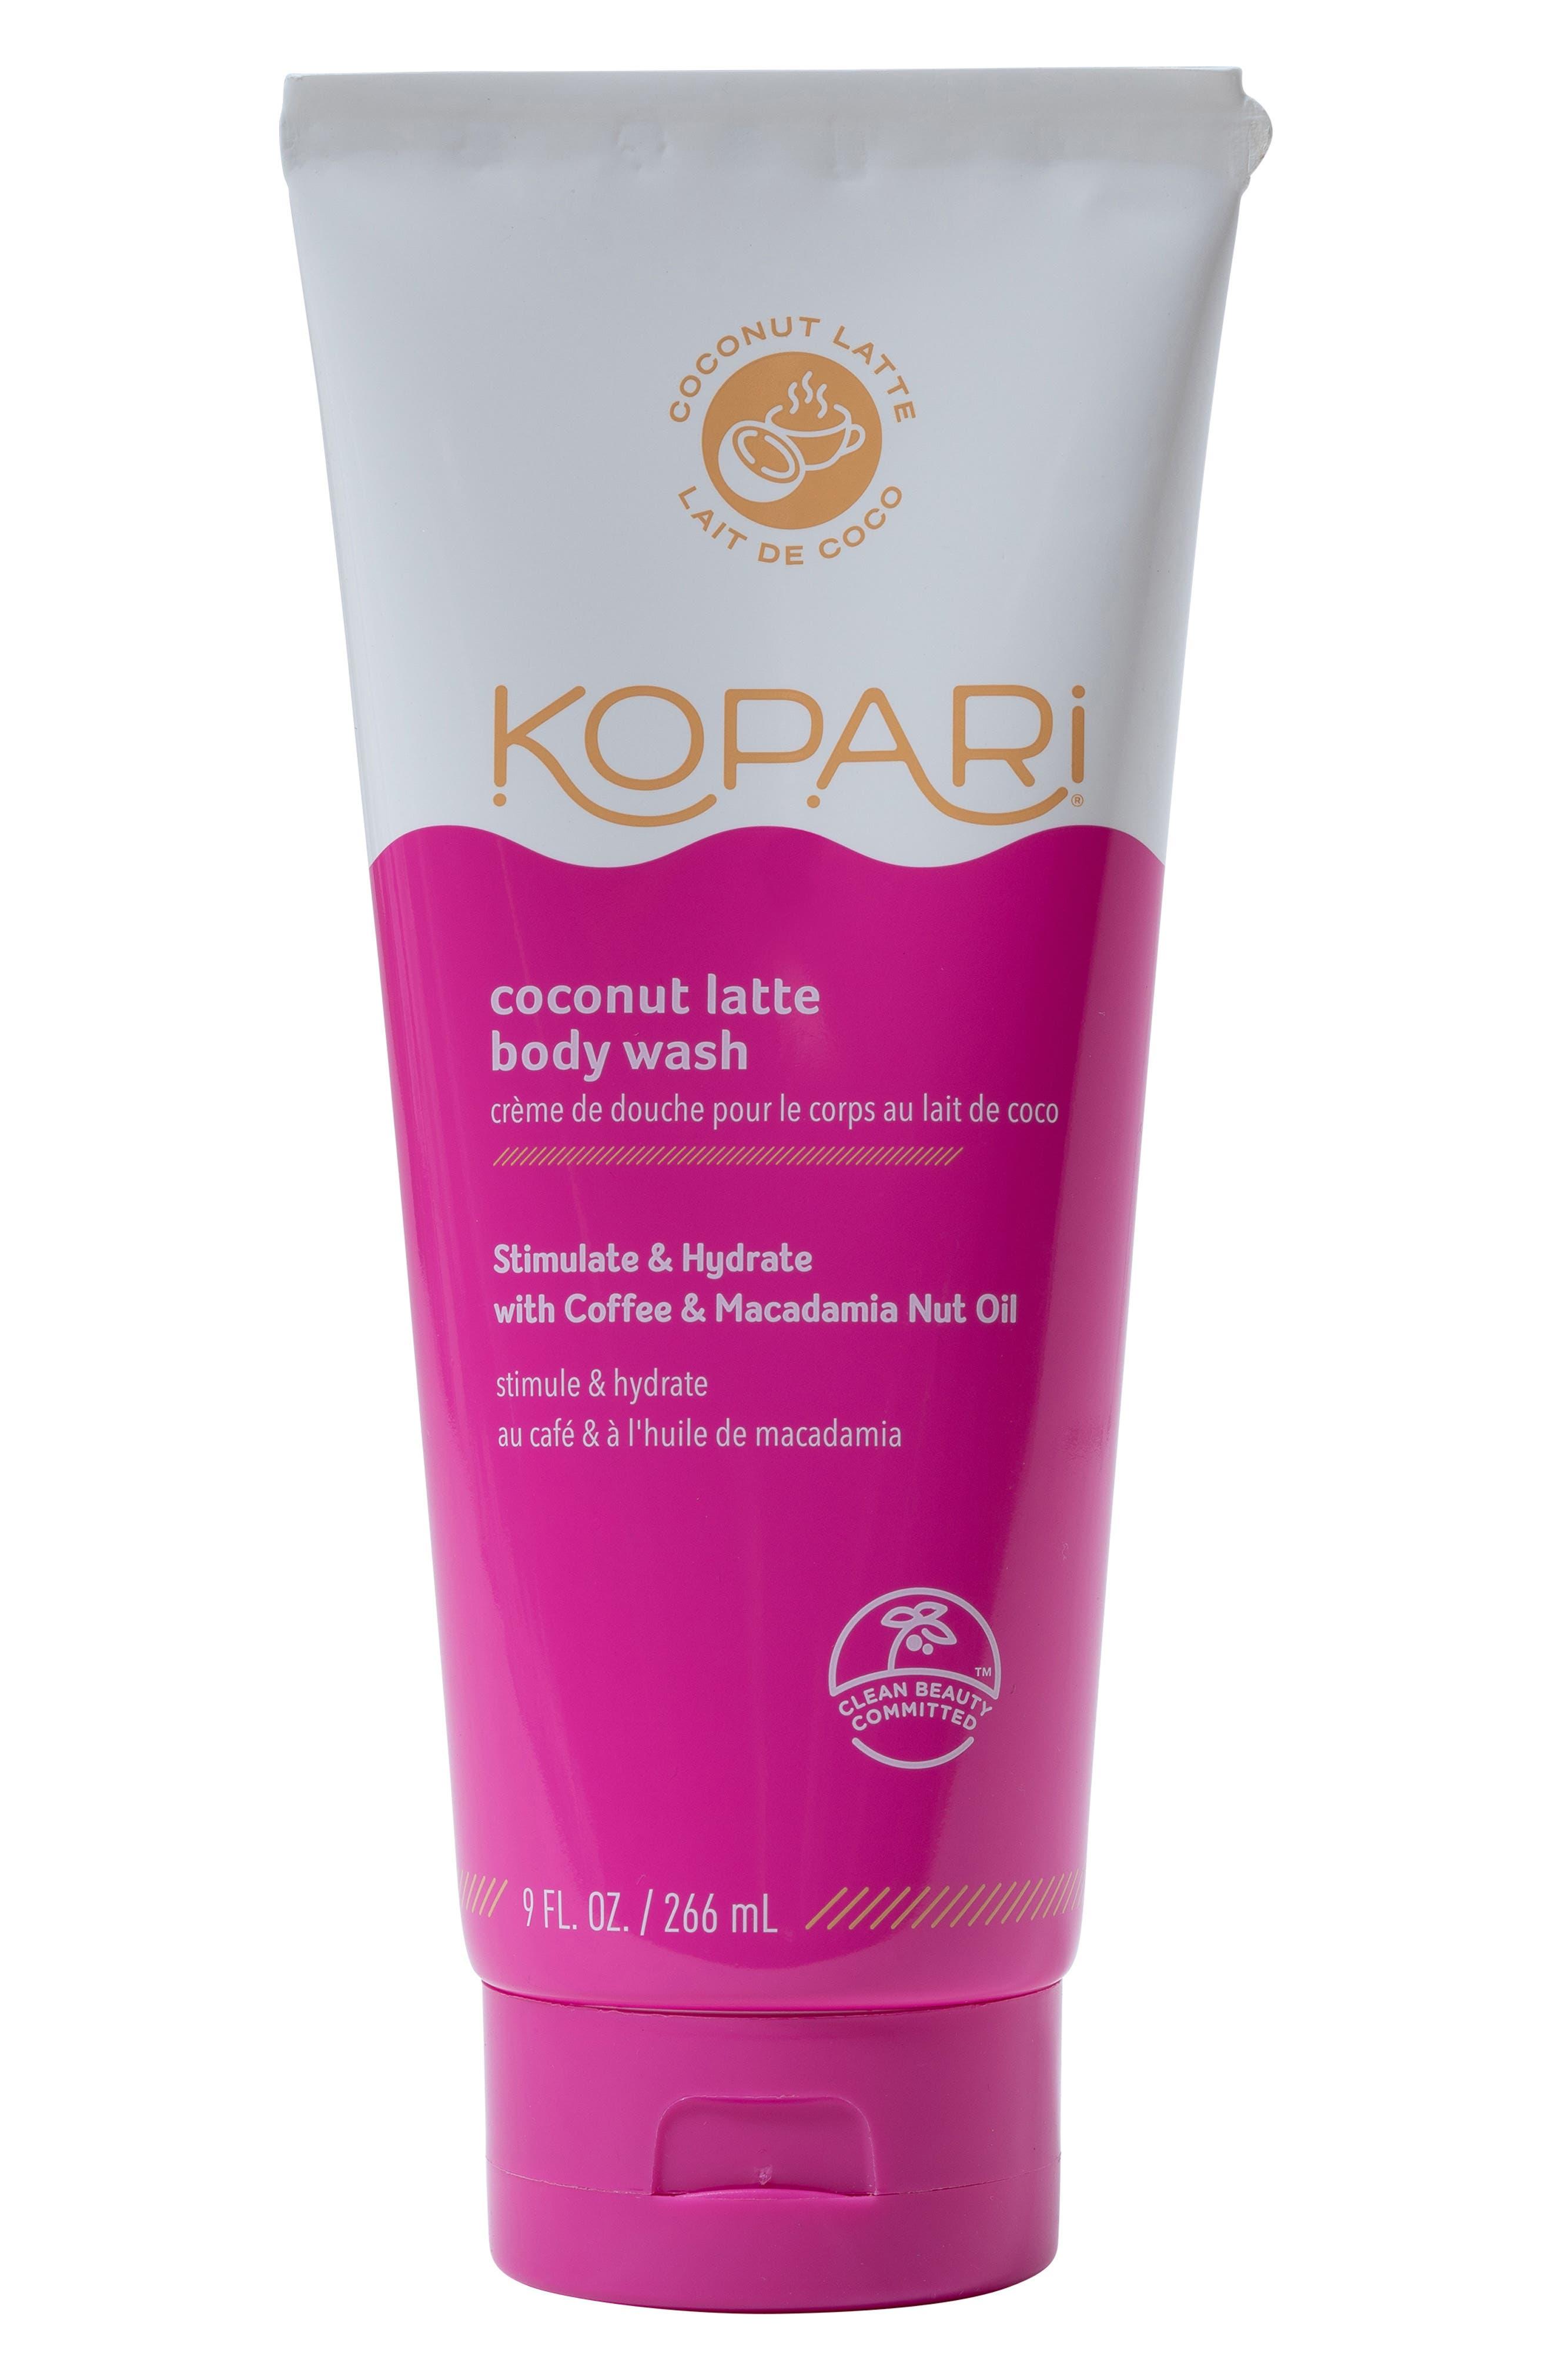 Coconut Latte Body Wash